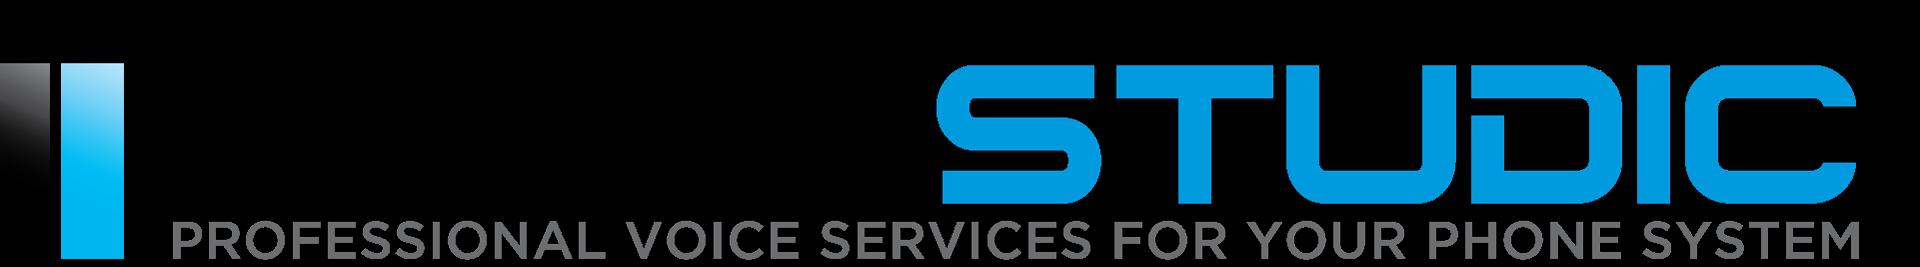 VoiceStudio Pro logo